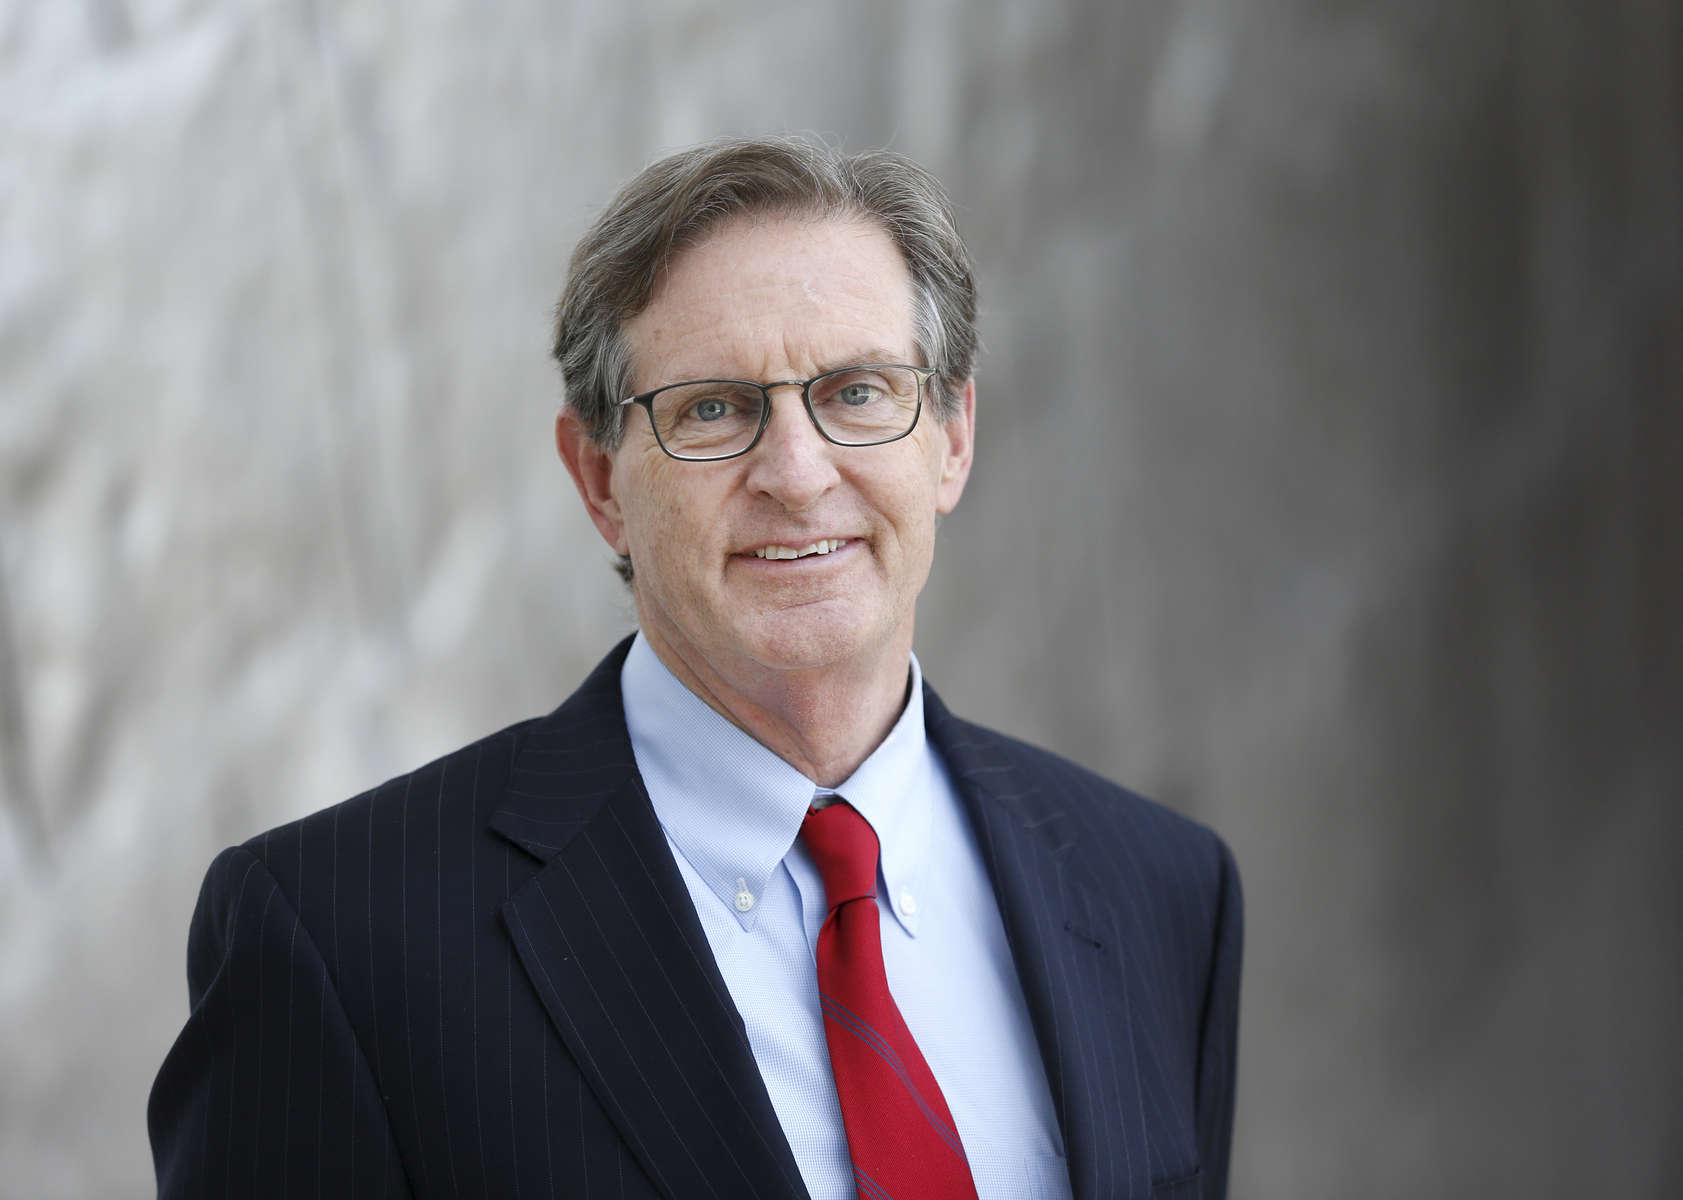 Dr. John Fitzgerald